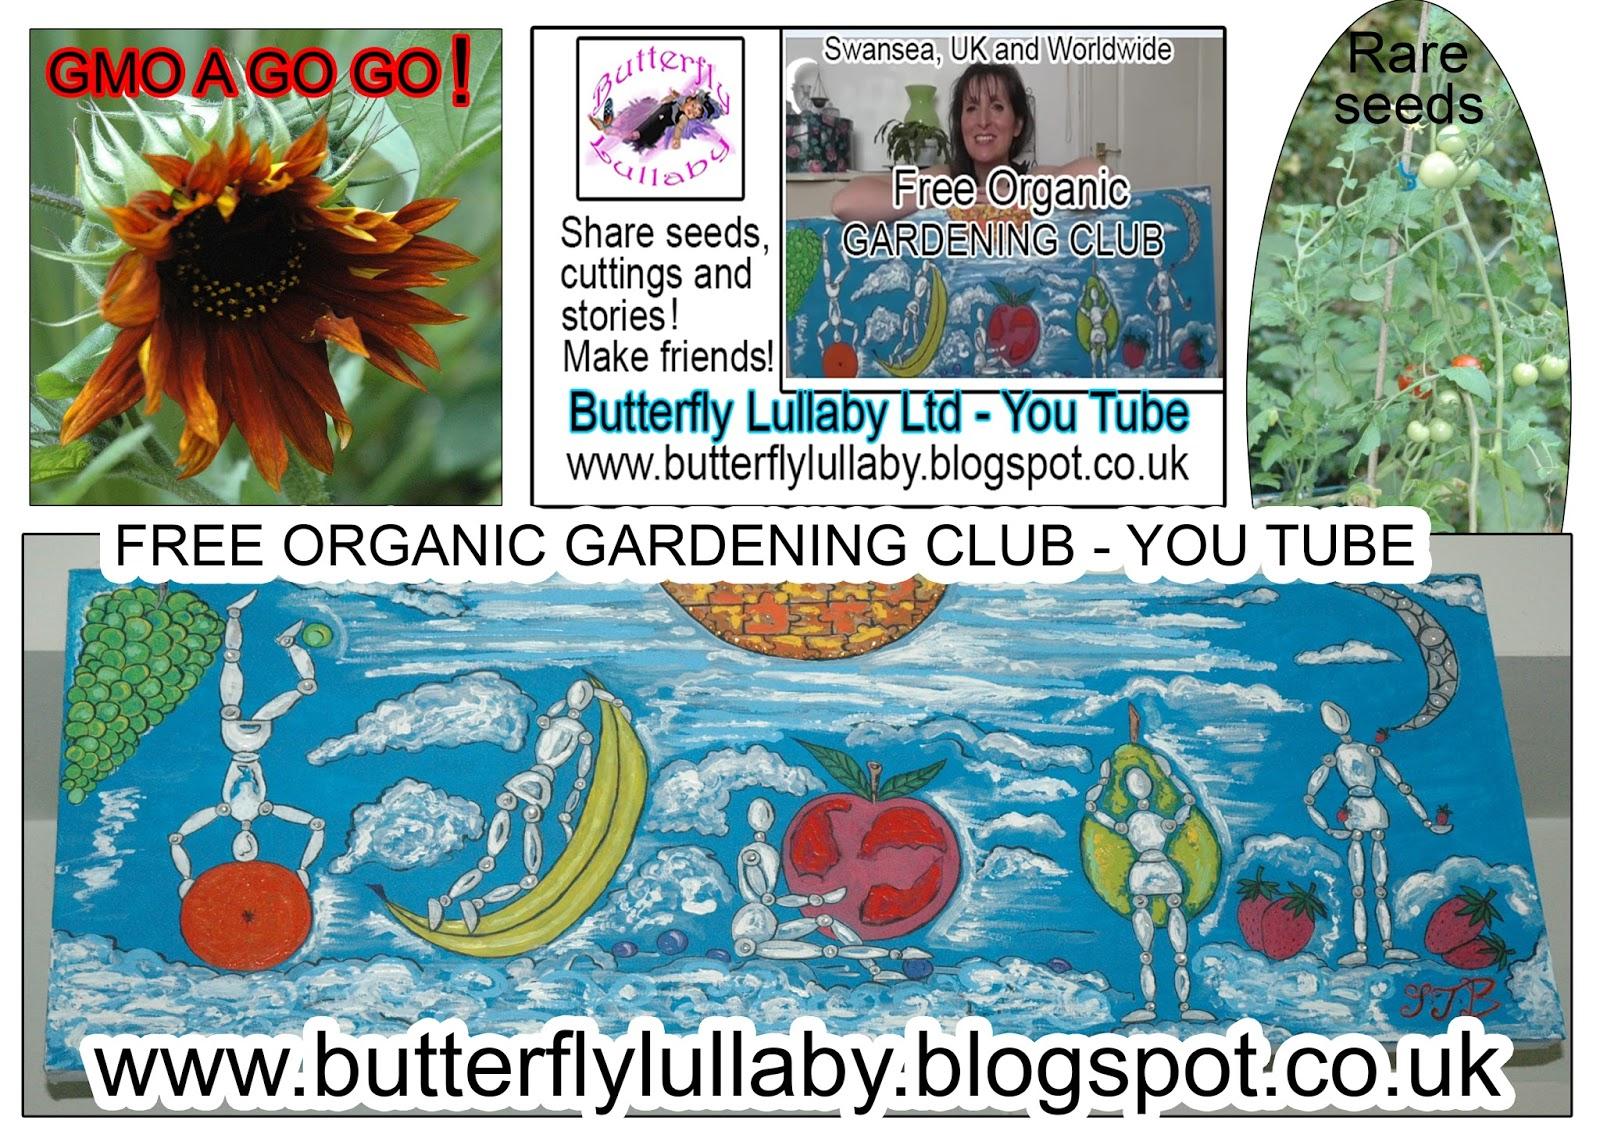 How to make scrapbook on facebook - Scrapbook With Me Sharon J Bainbridge Http Www Facebook Com People Sharon J Bainbridge 595087537 Www Butterflylullaby Co Uk Fairy Songs